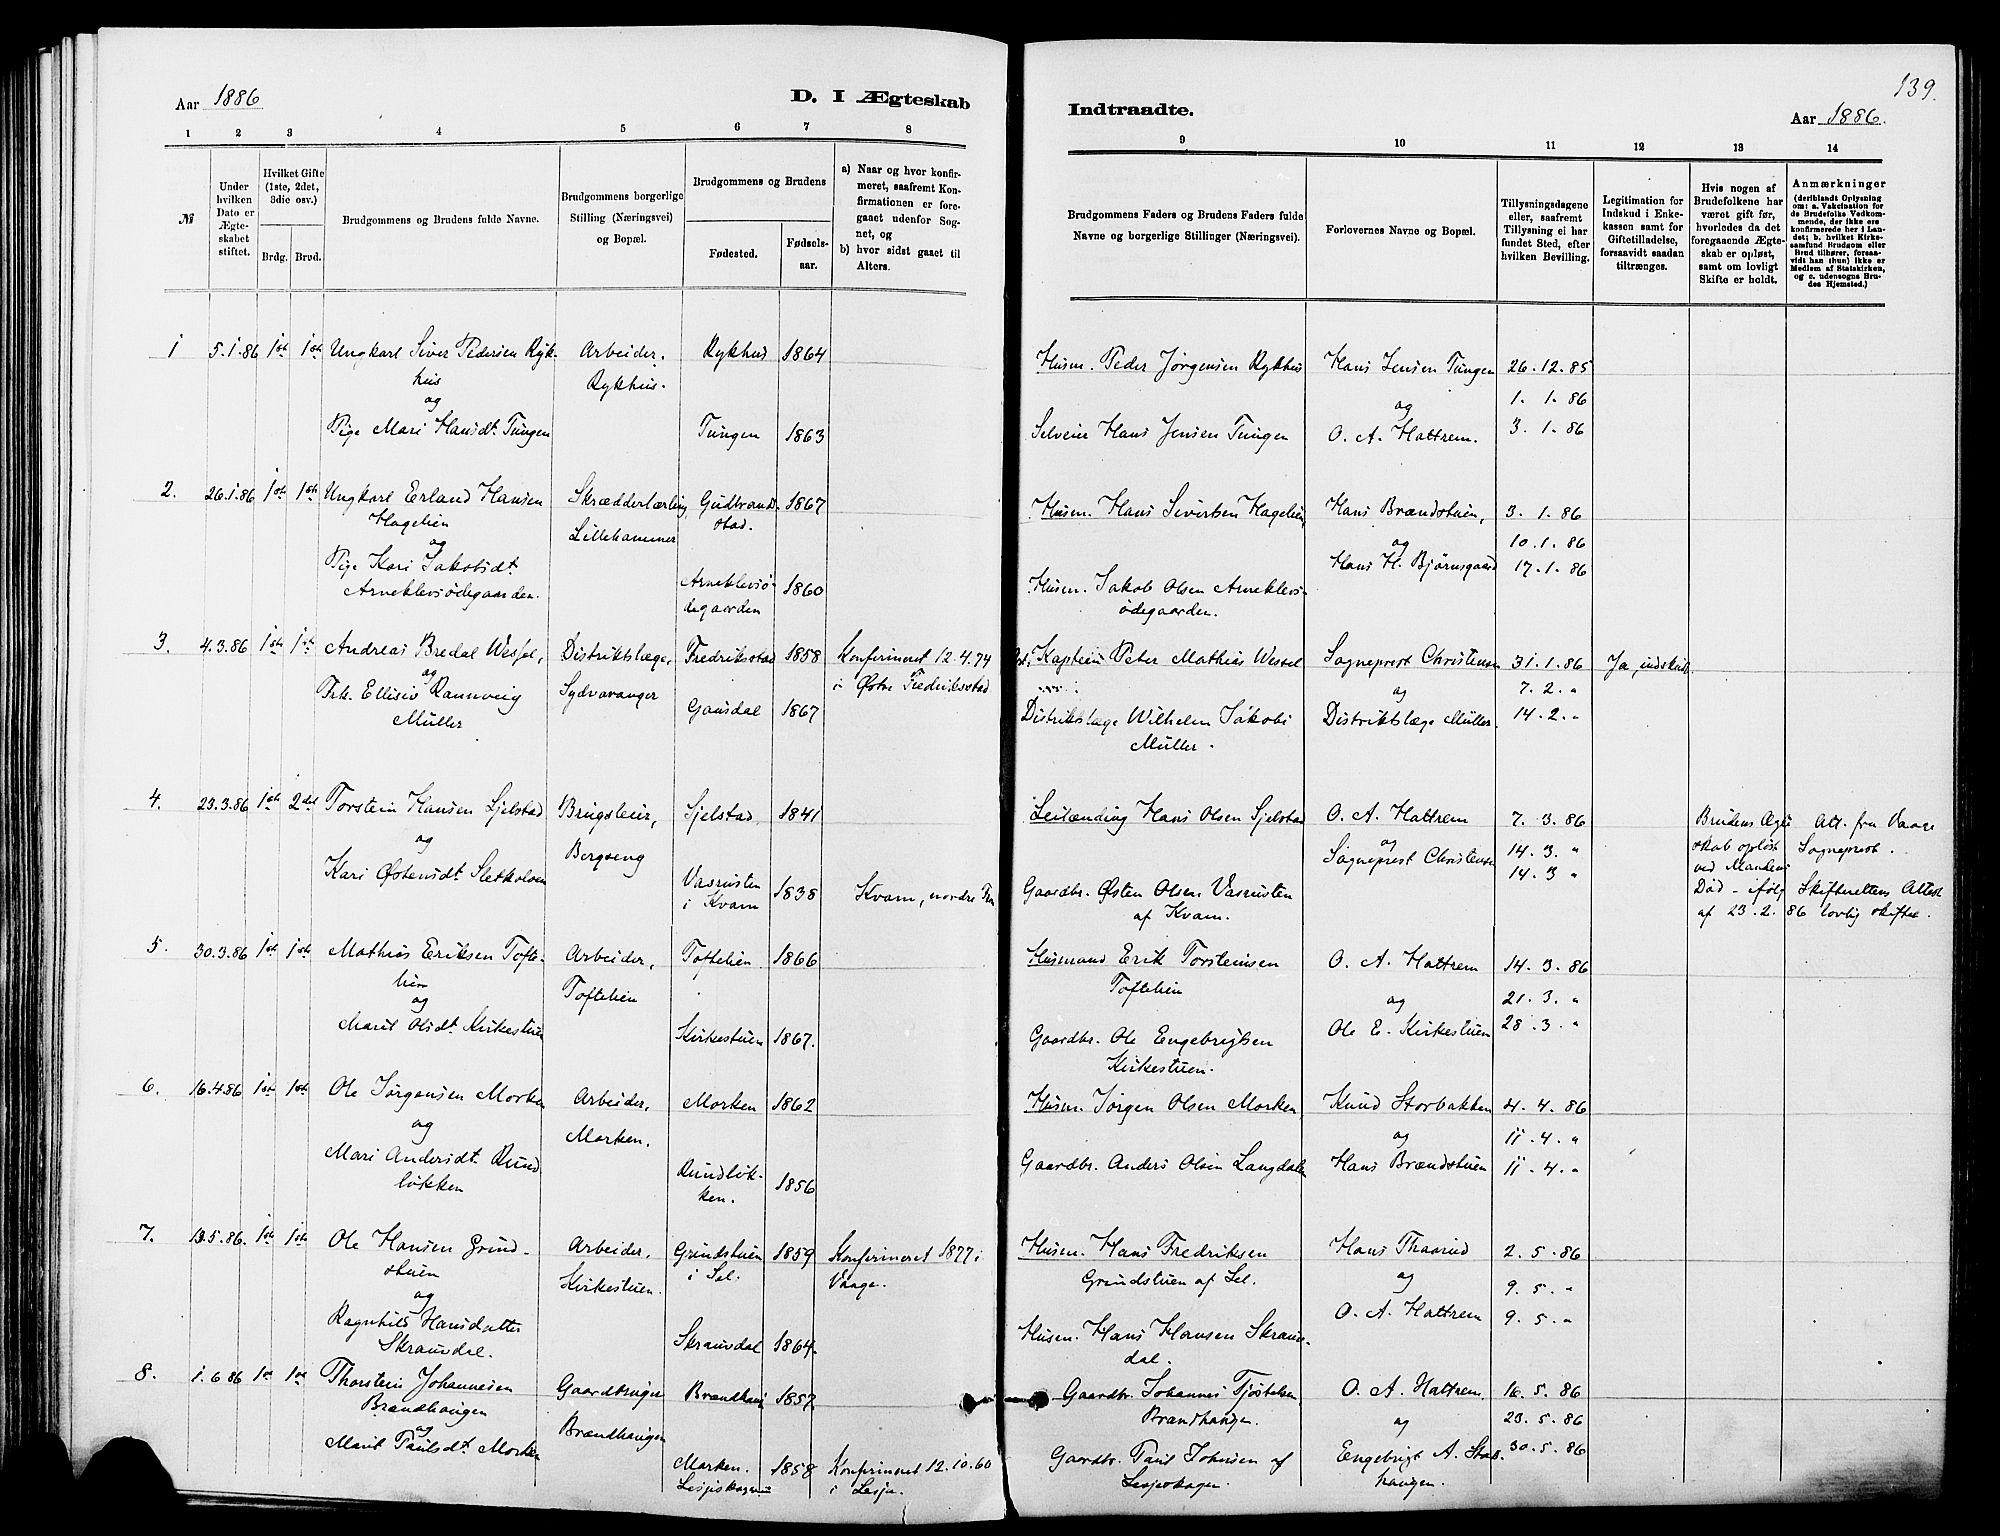 SAH, Dovre prestekontor, Ministerialbok nr. 2, 1879-1890, s. 139